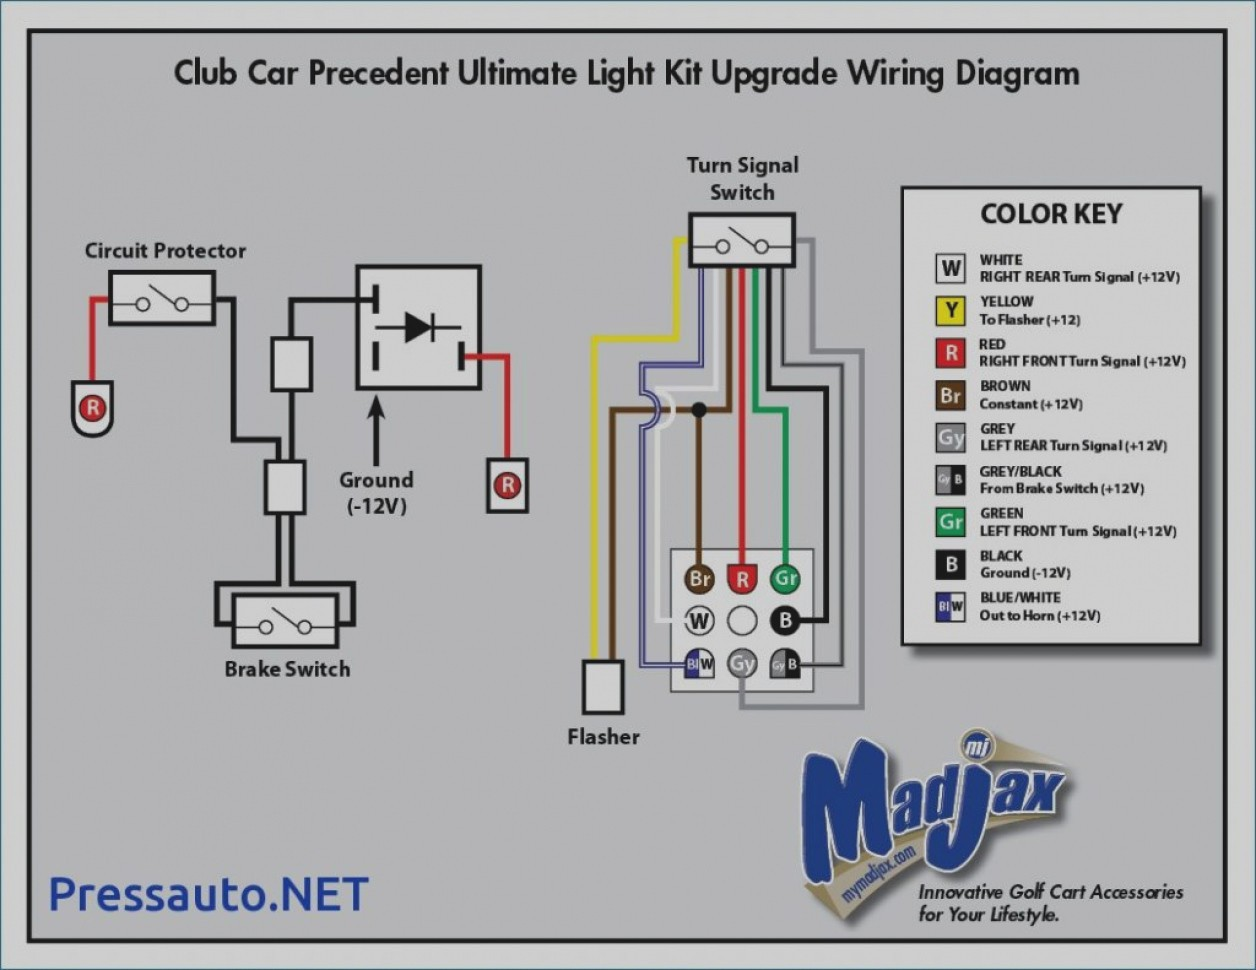 Ezgo Wiring Diagram Inspirational Ezgo Ignition Switch Wiring Diagram Save for Club Car Electric Golf Stock